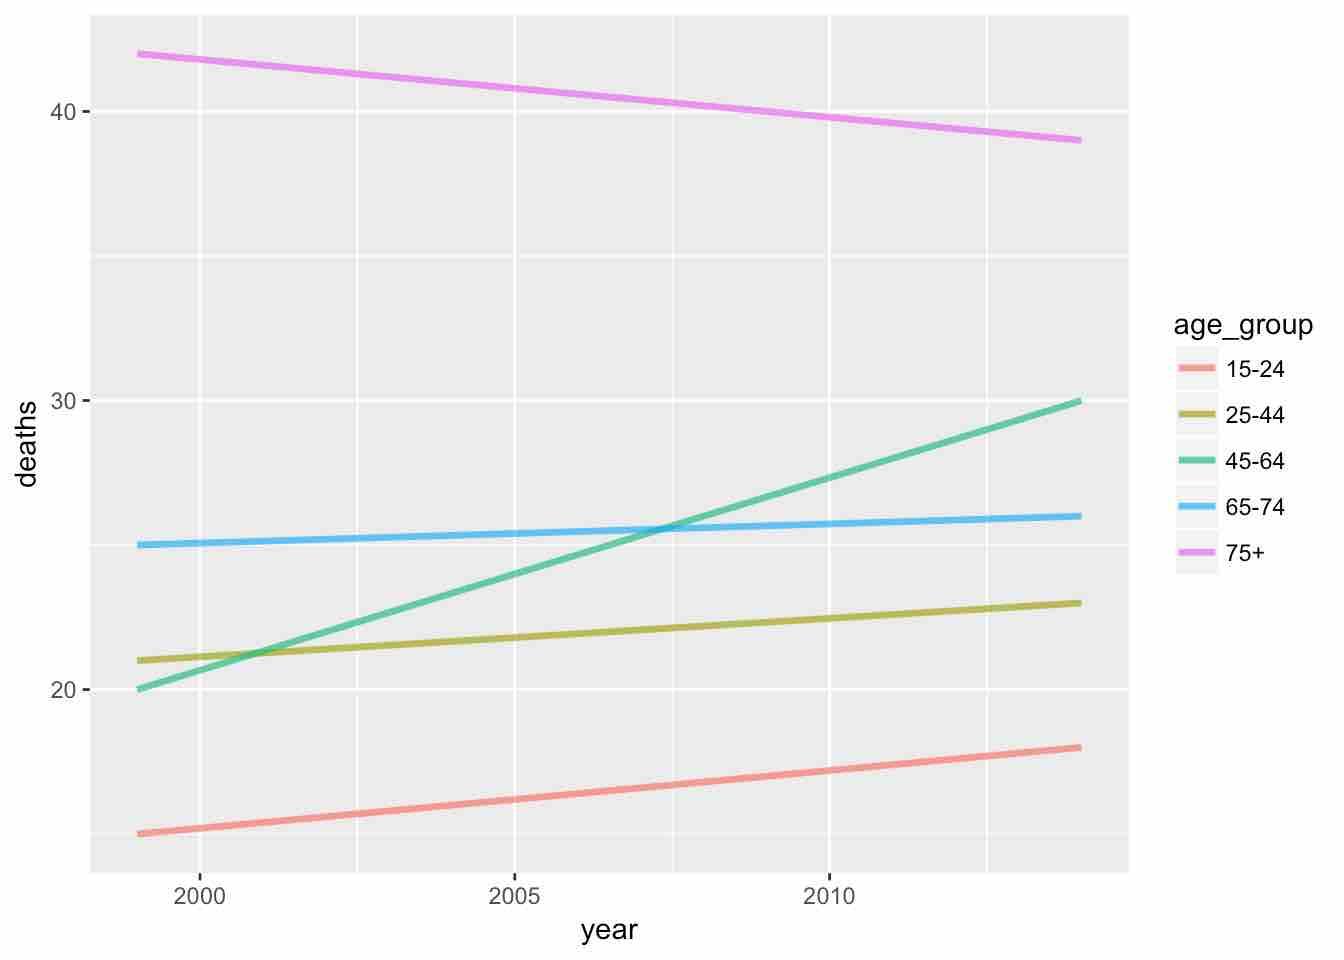 nyt-best-data-visualization-plot